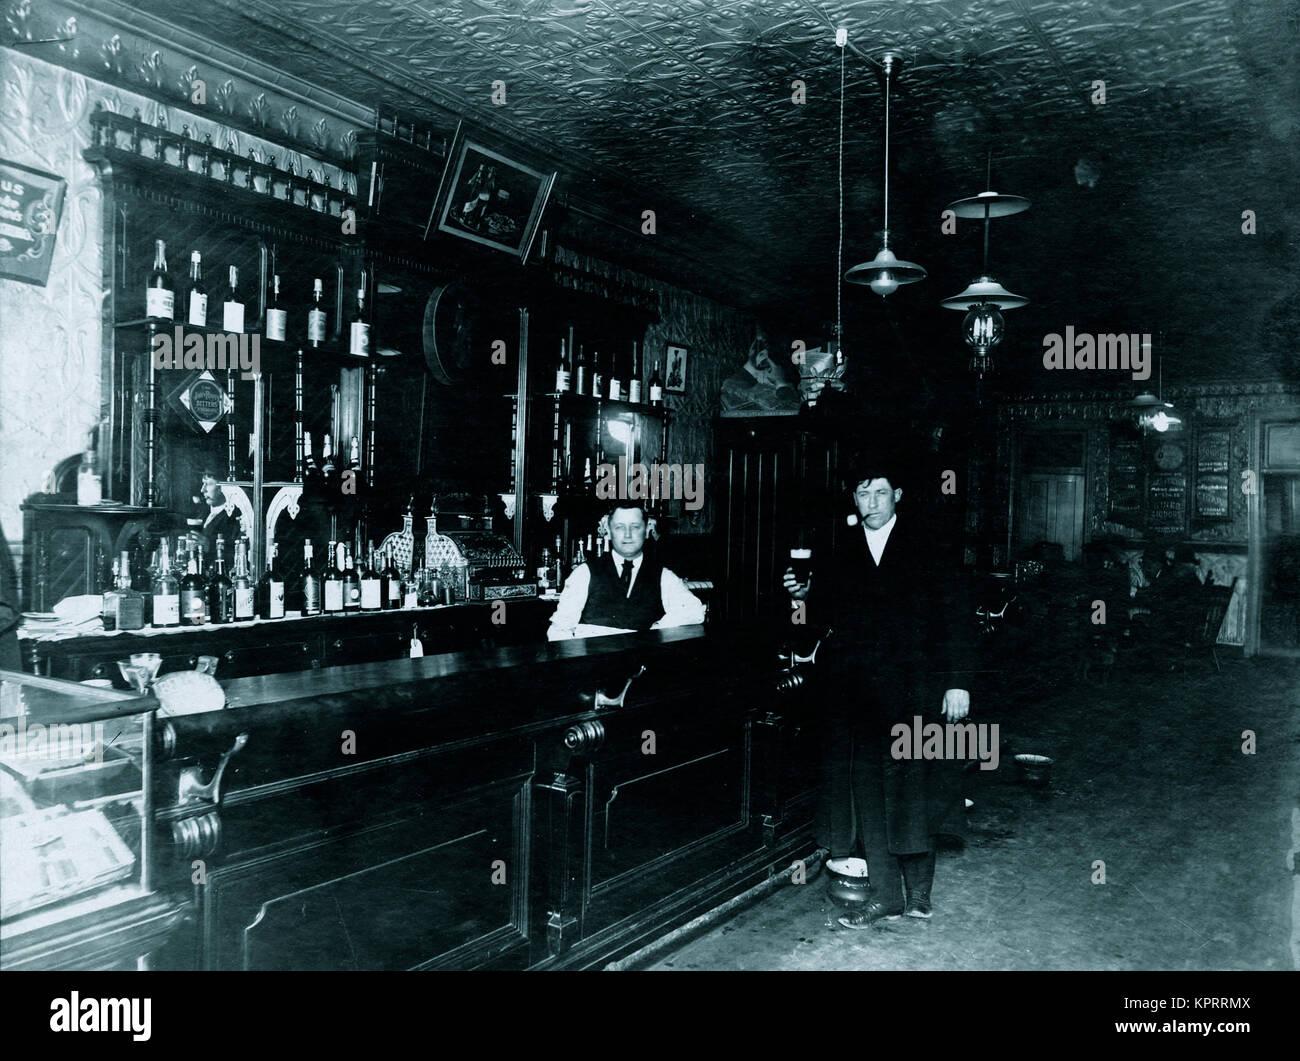 Saloon 1890'S - Stock Image